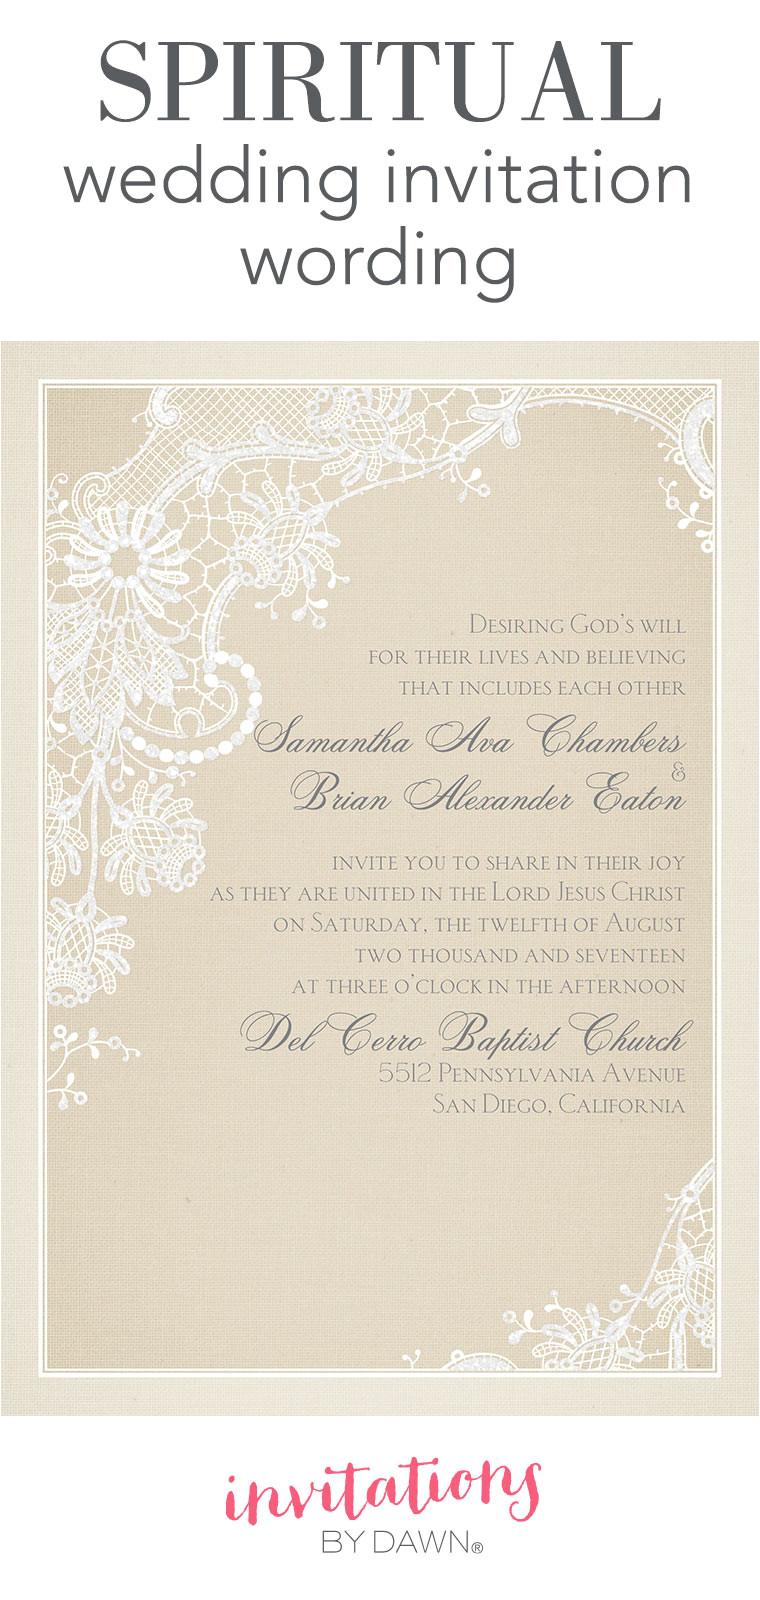 spiritual wedding invitation wording